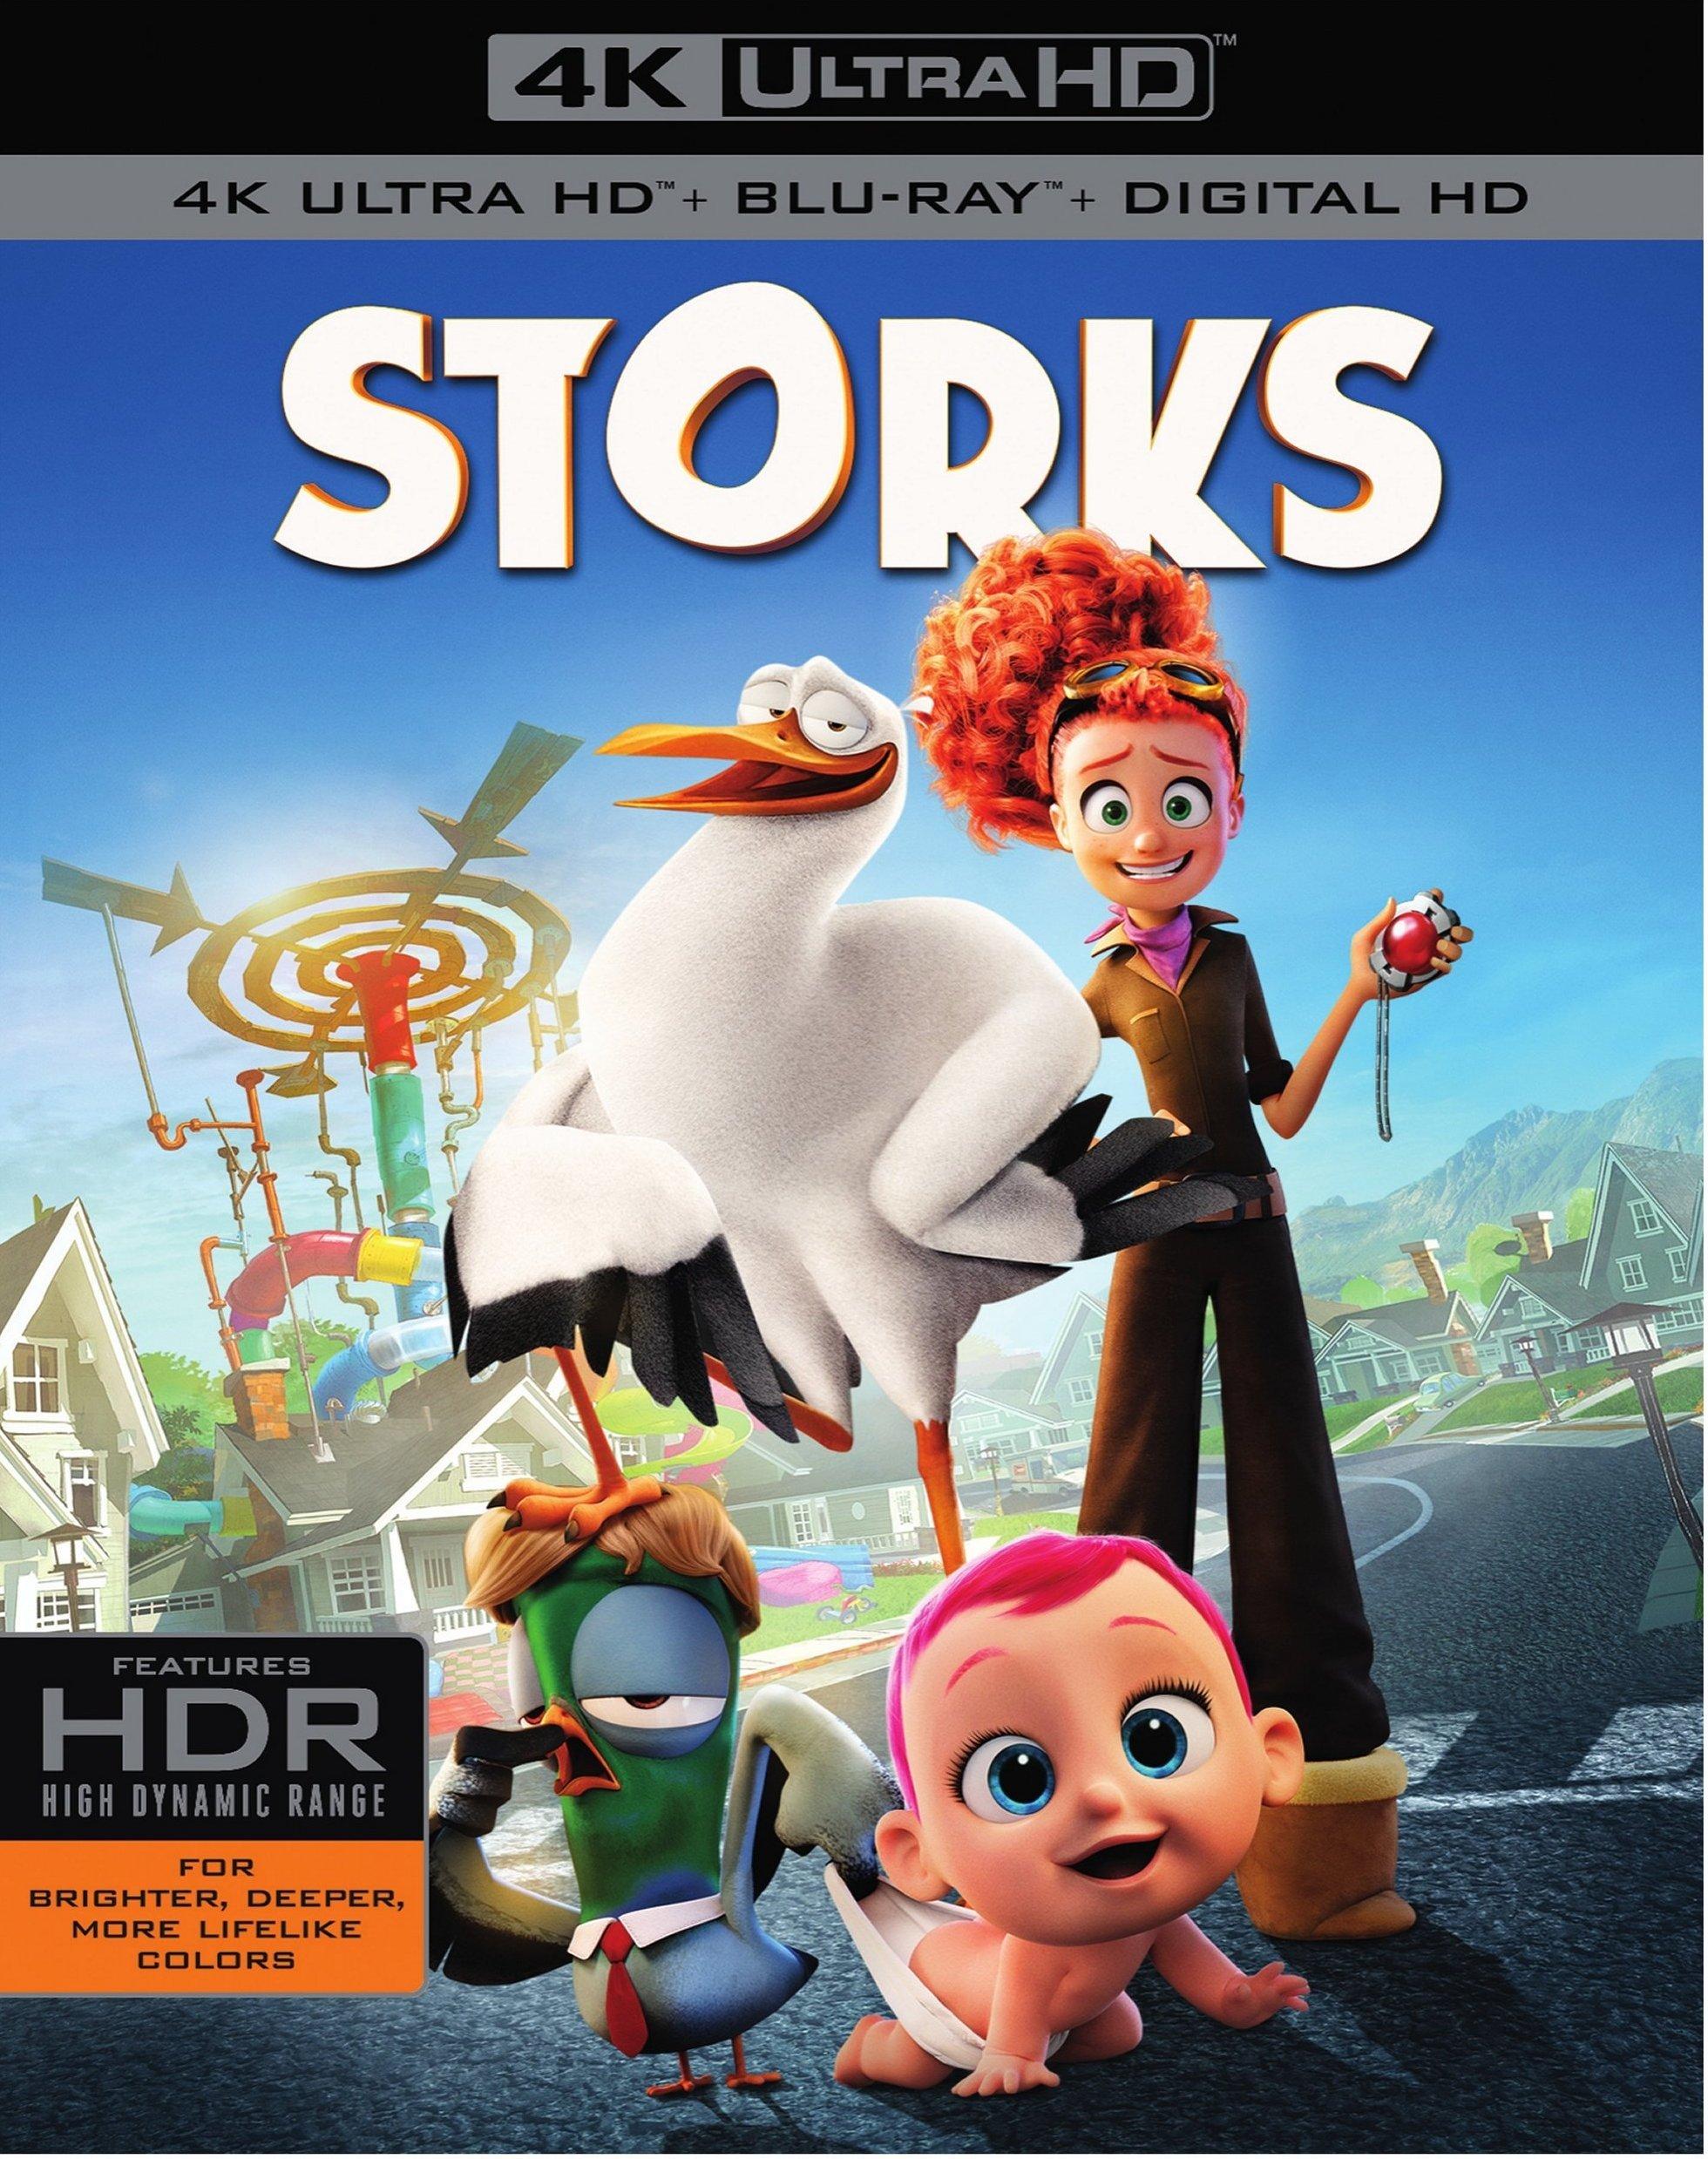 Storks 4K (2016) 4K Ultra HD Blu-ray